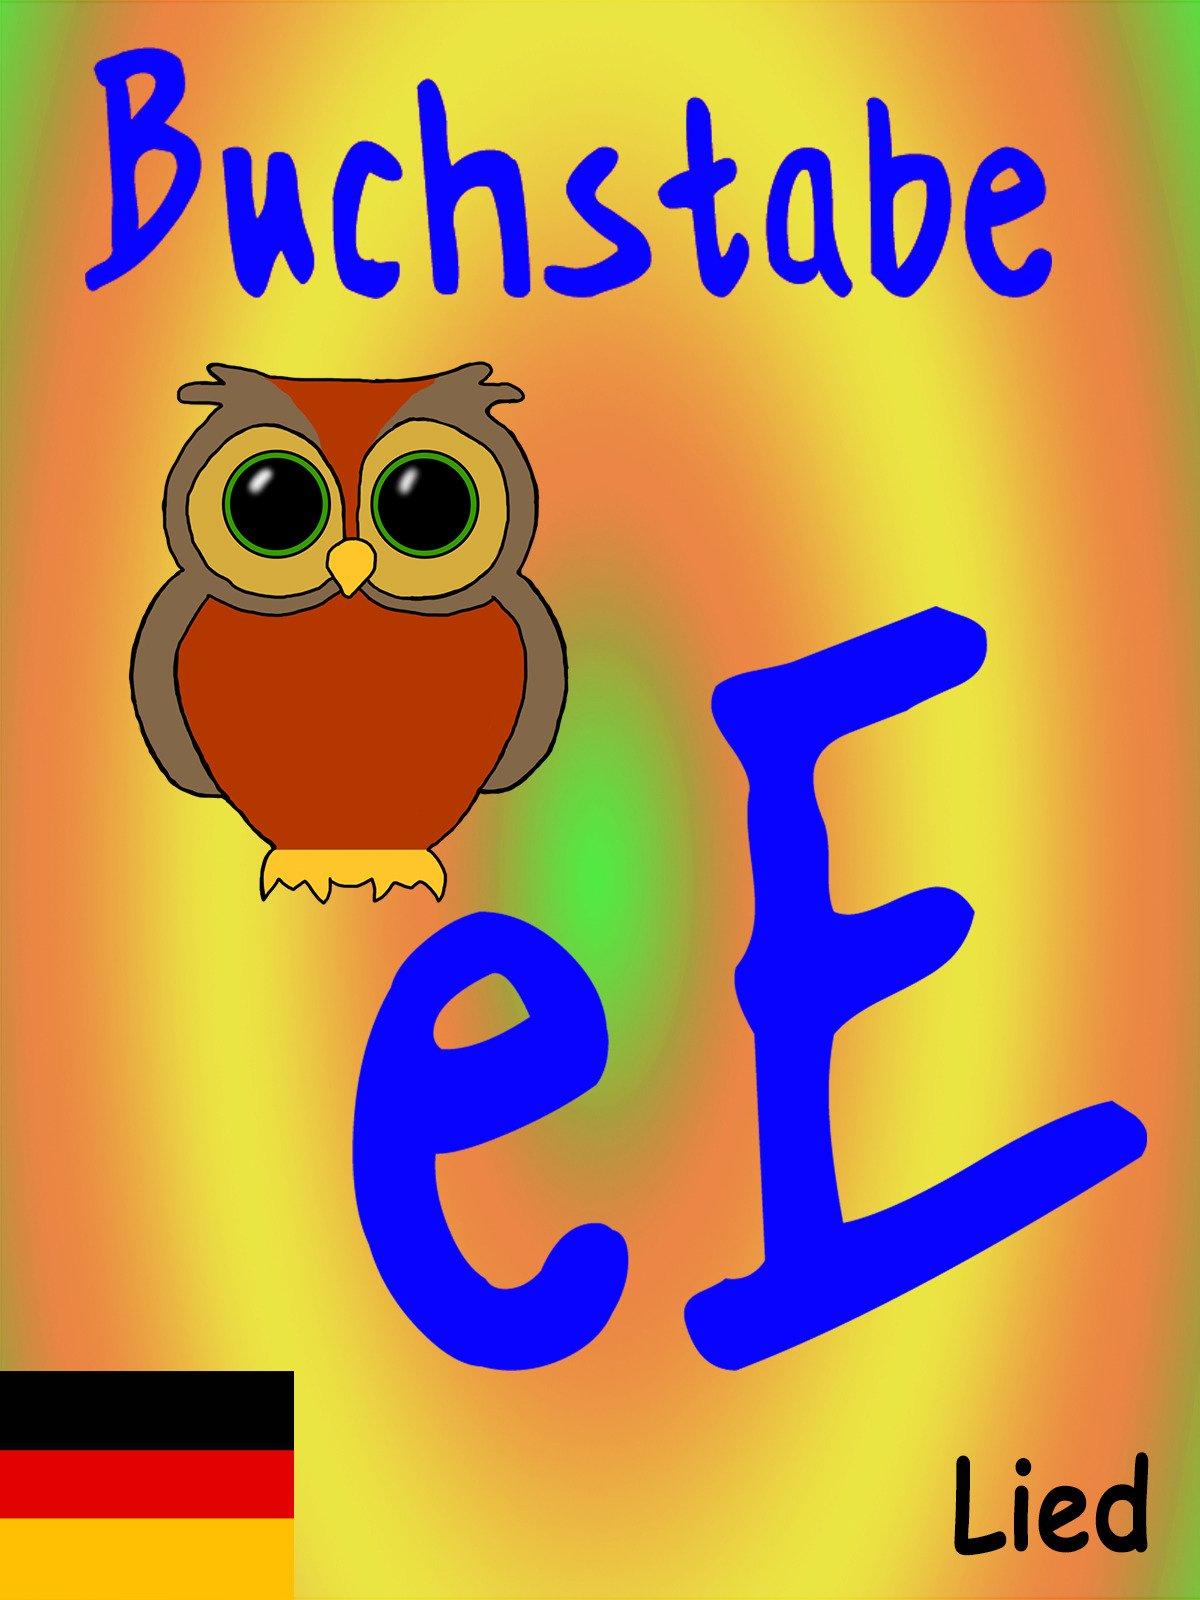 Clip: Buchstabe E Lied